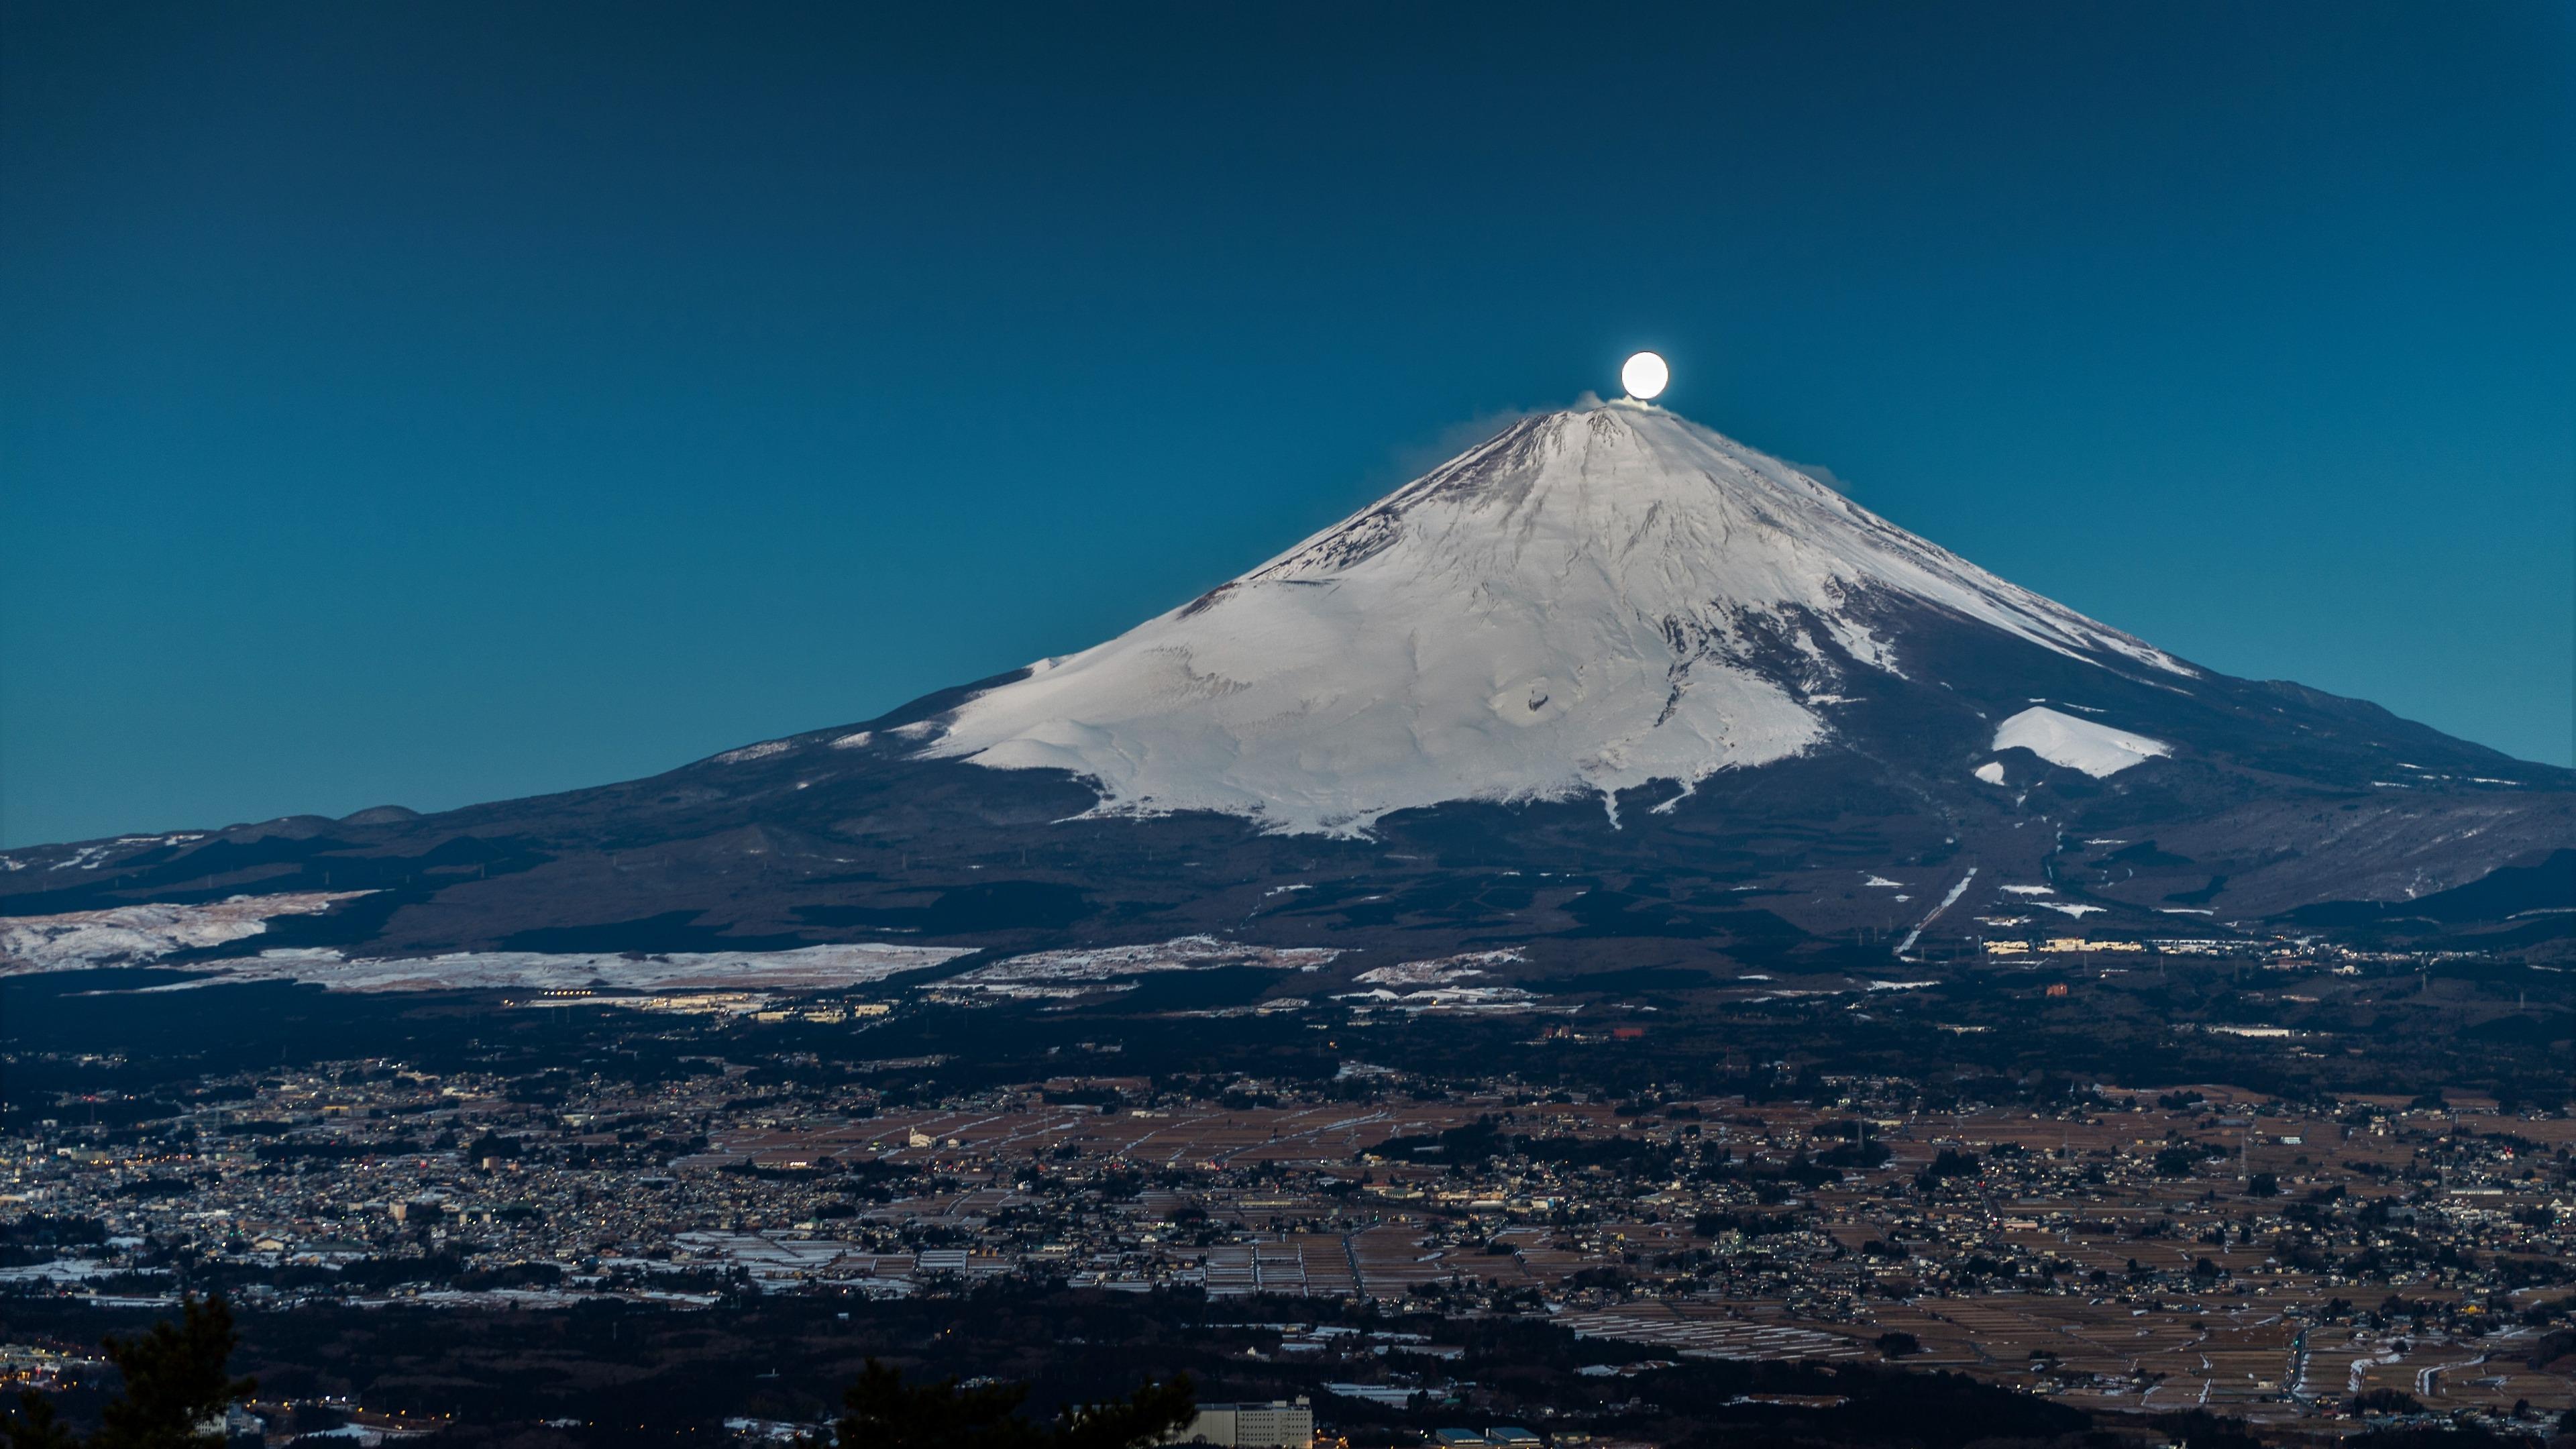 Full moon on the top of Mount Fuji wallpaper